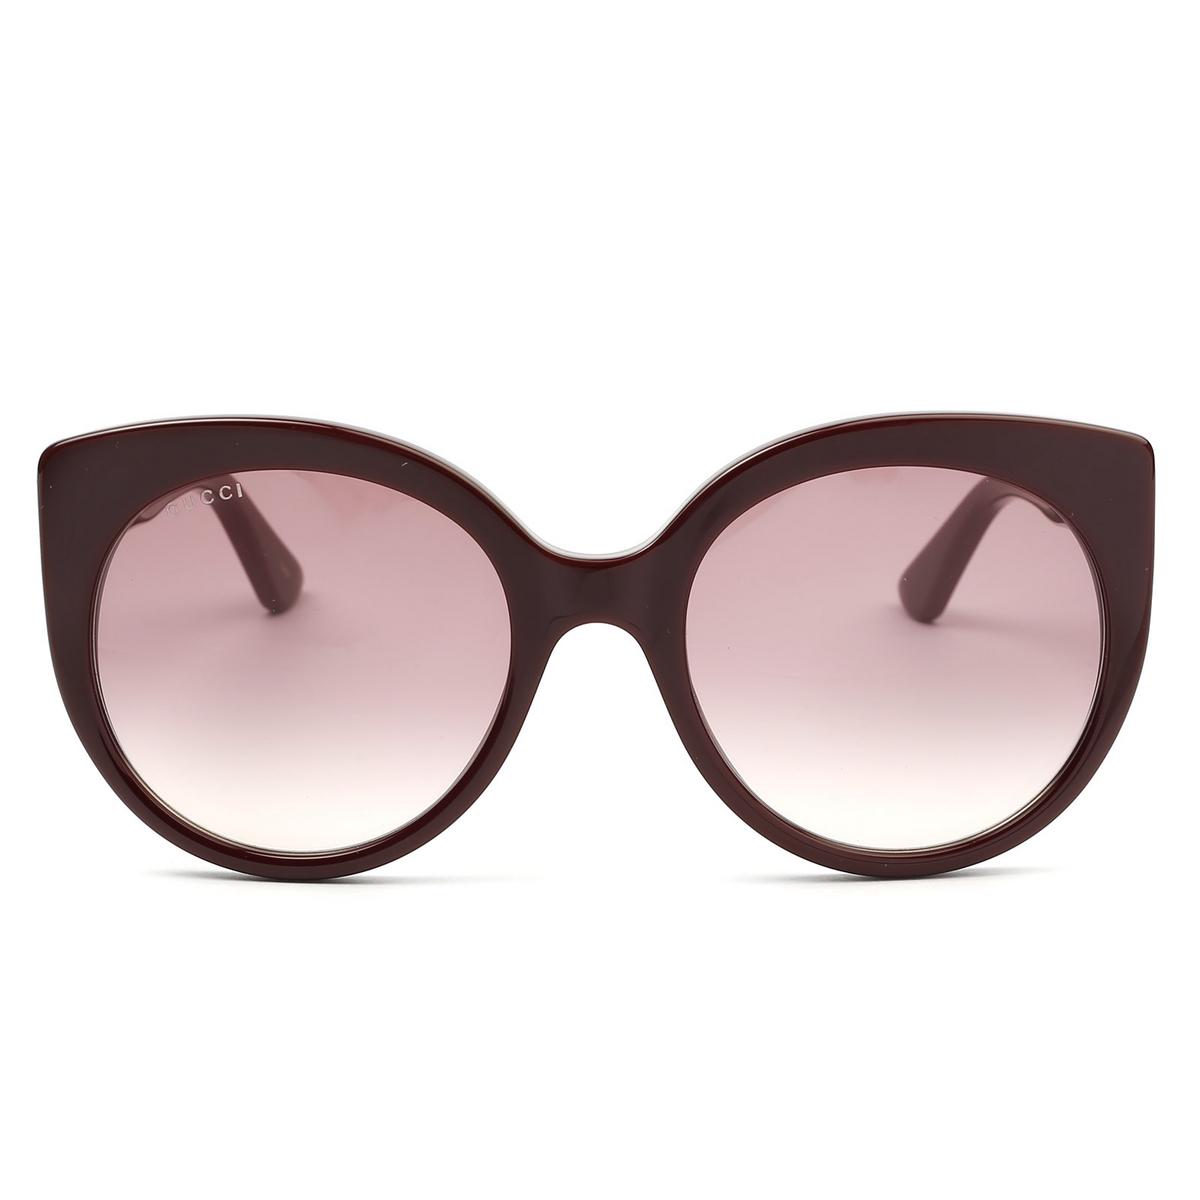 Gucci® Cat-eye Sunglasses: GG0325S color Burgundy 007 - 1/4.